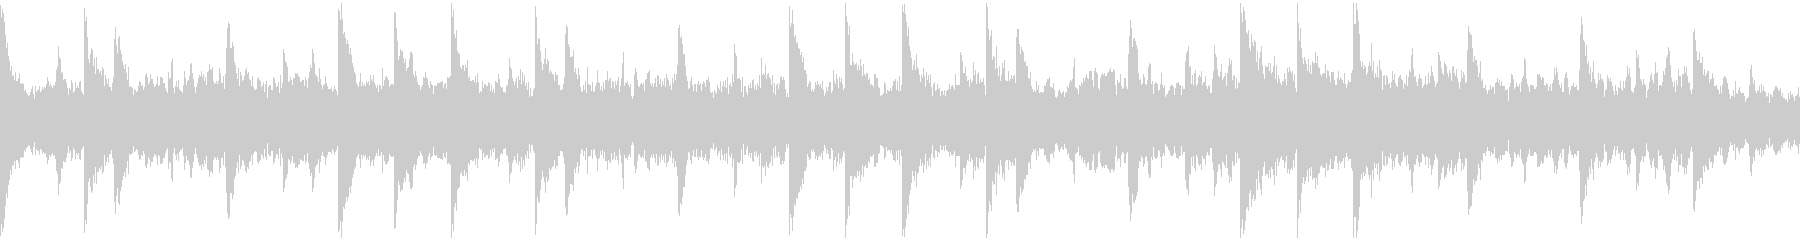 Melodic Electro-A...'s unreproduced waveform